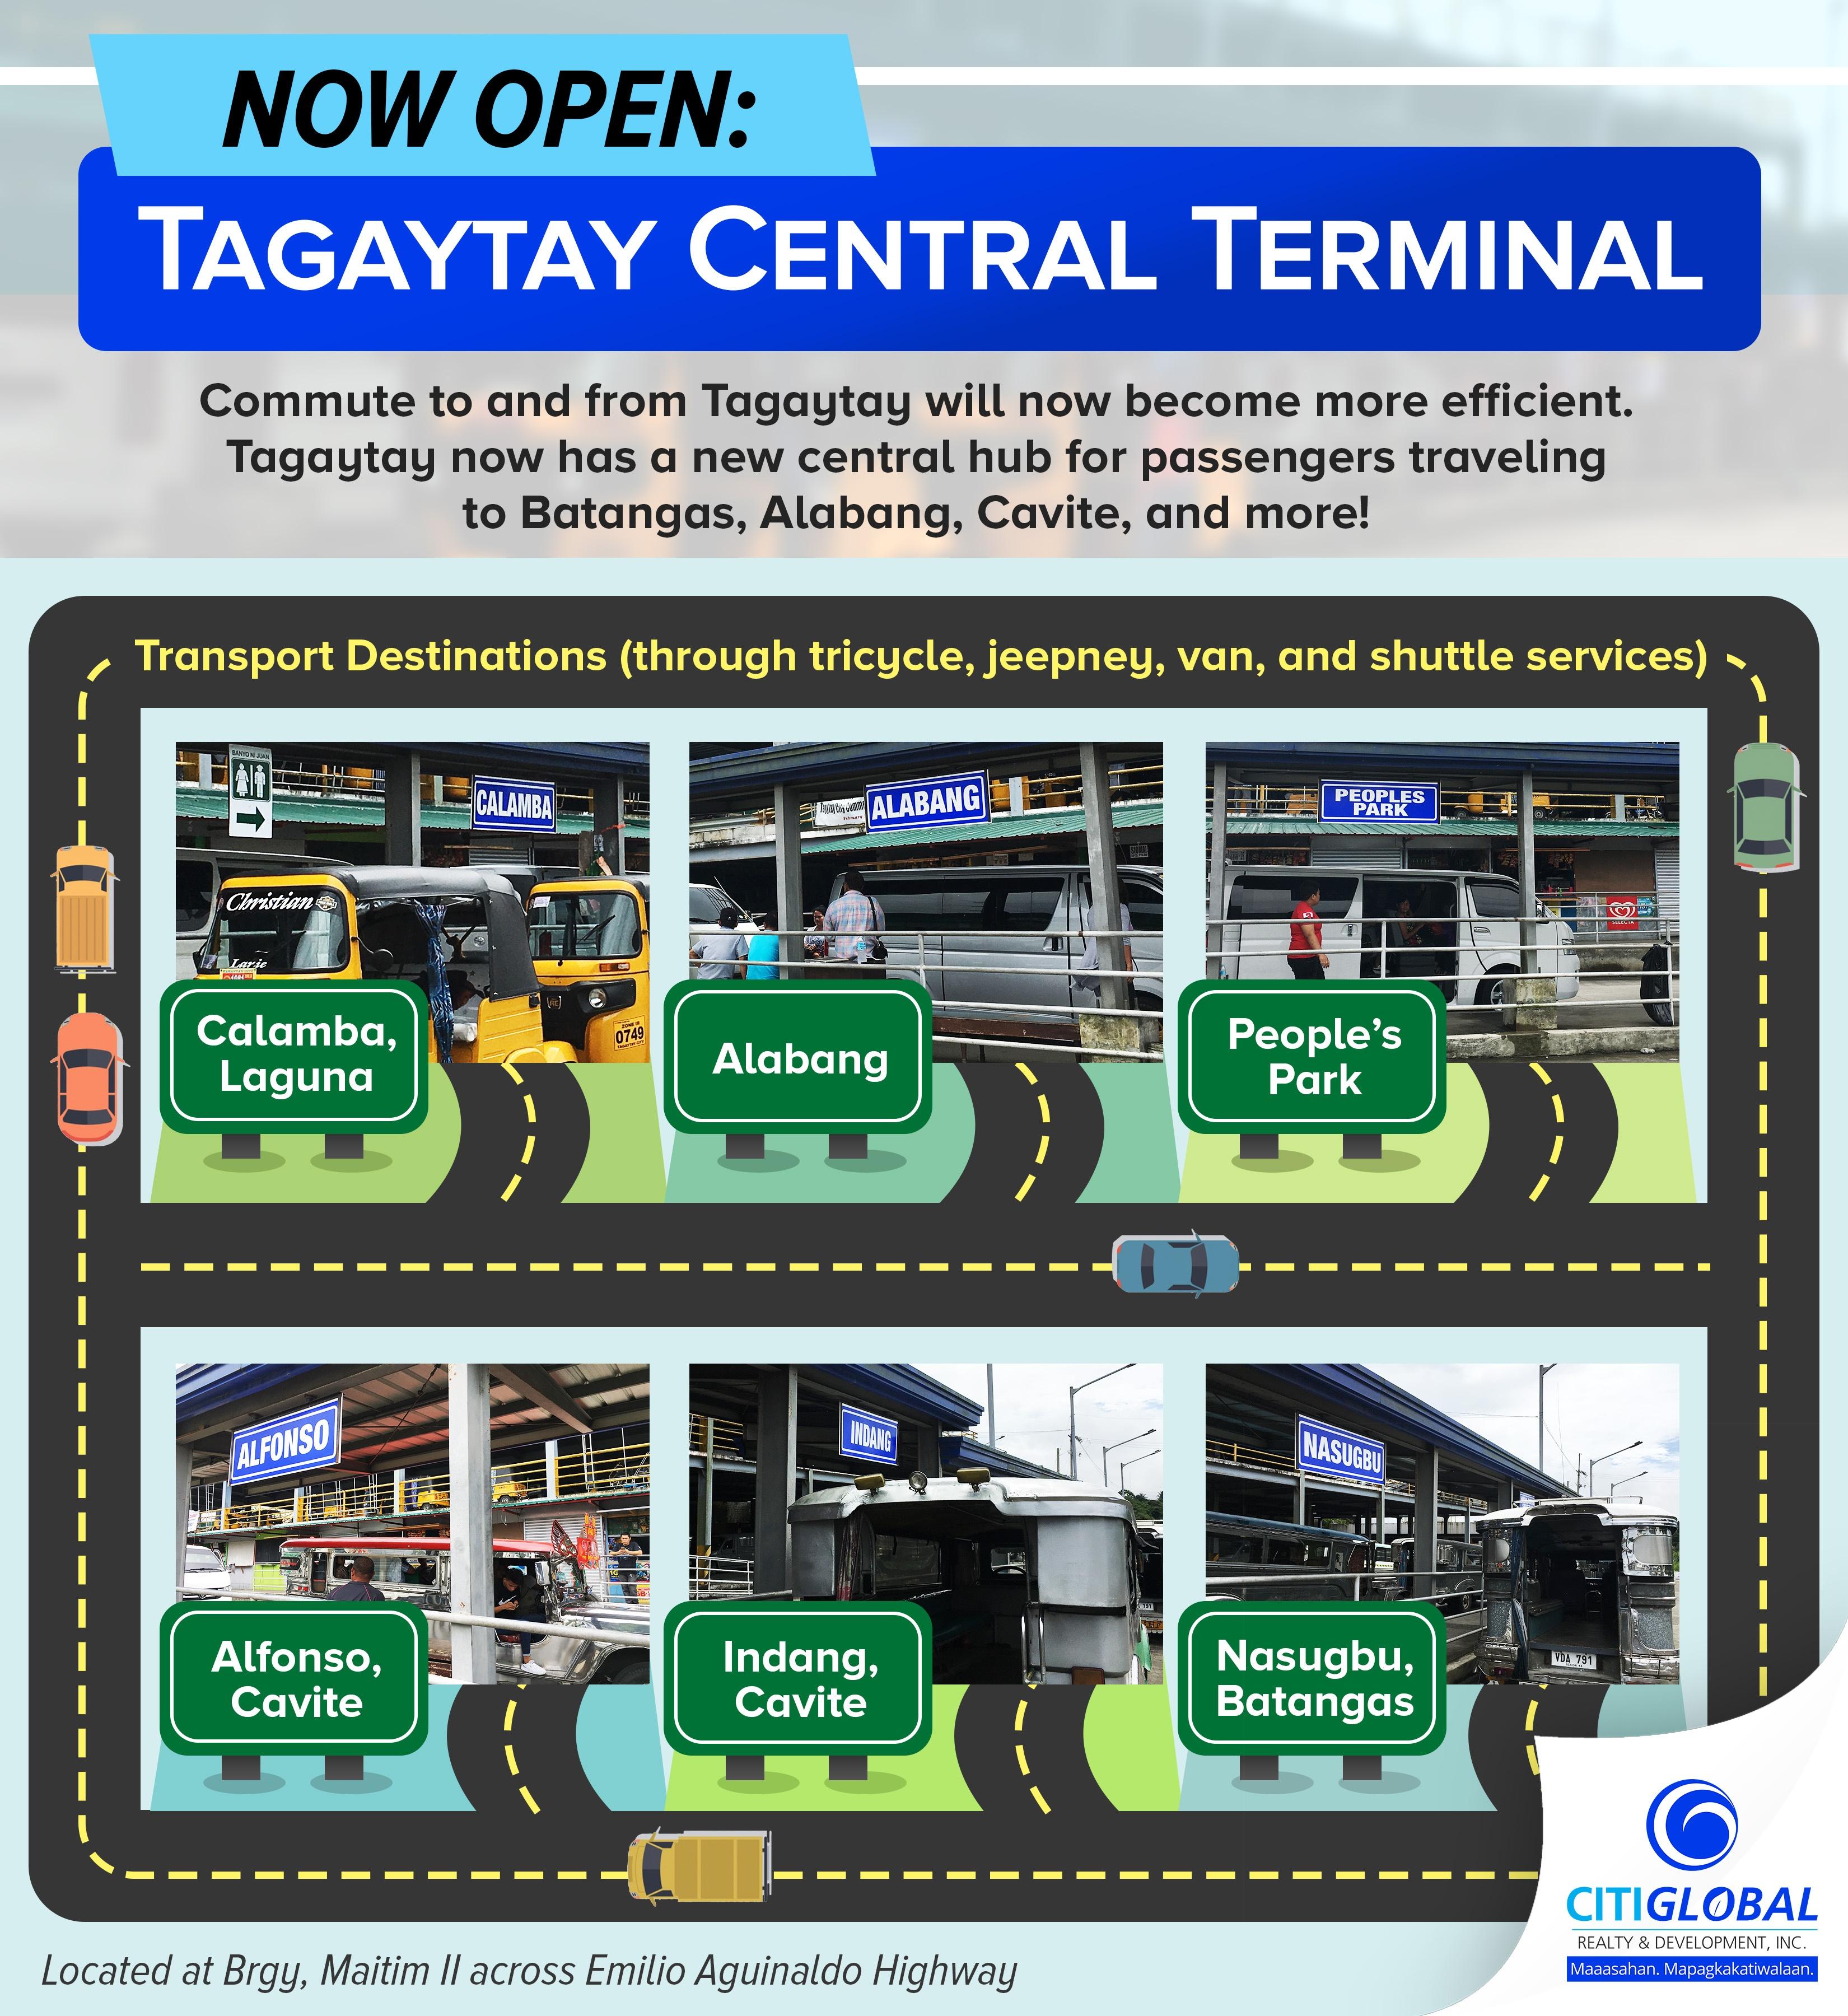 Tagaytay Central Terminal